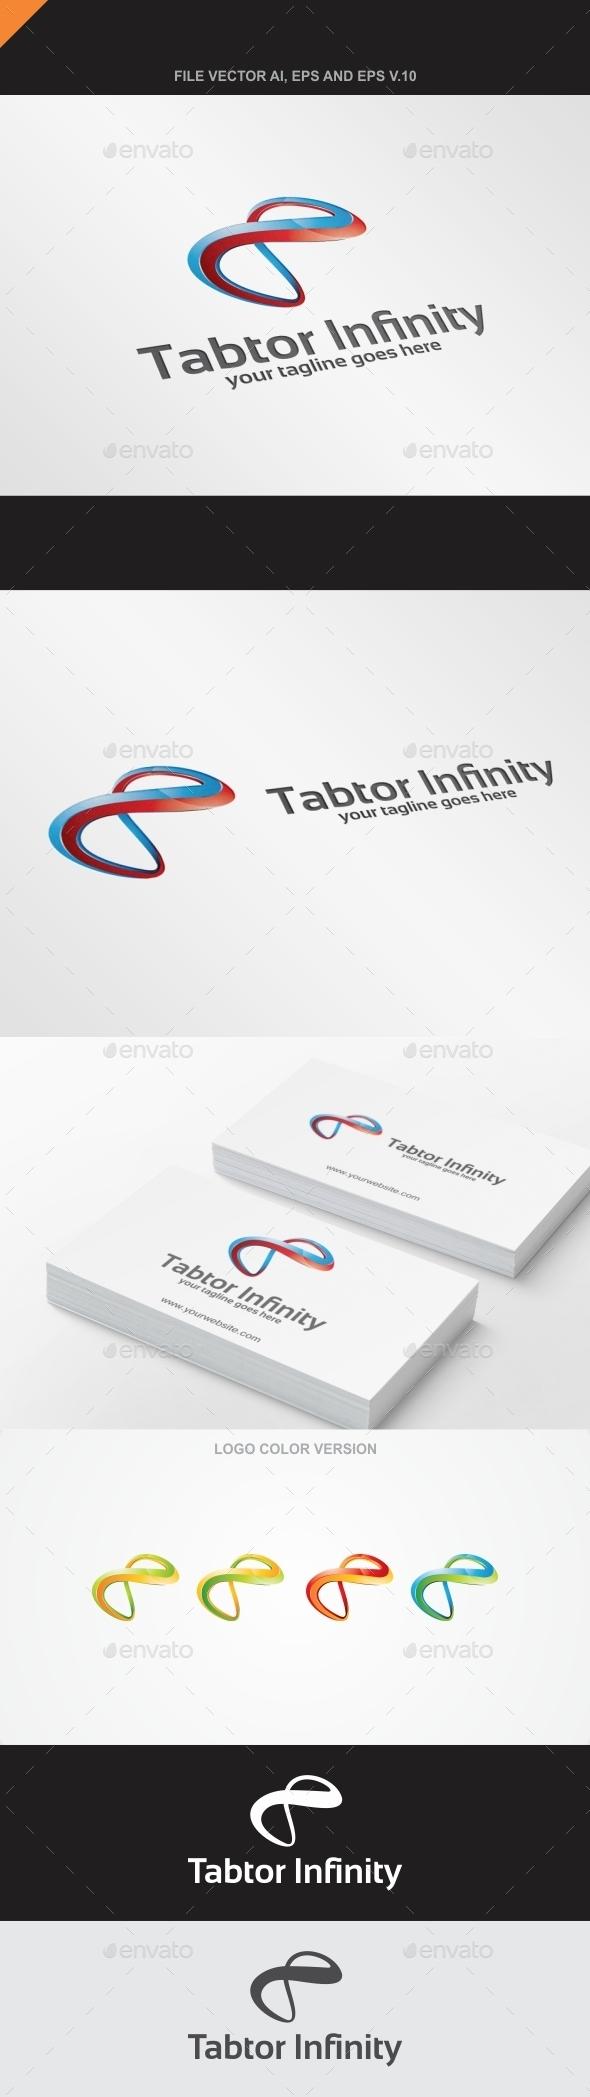 Tabtor Infinity logo